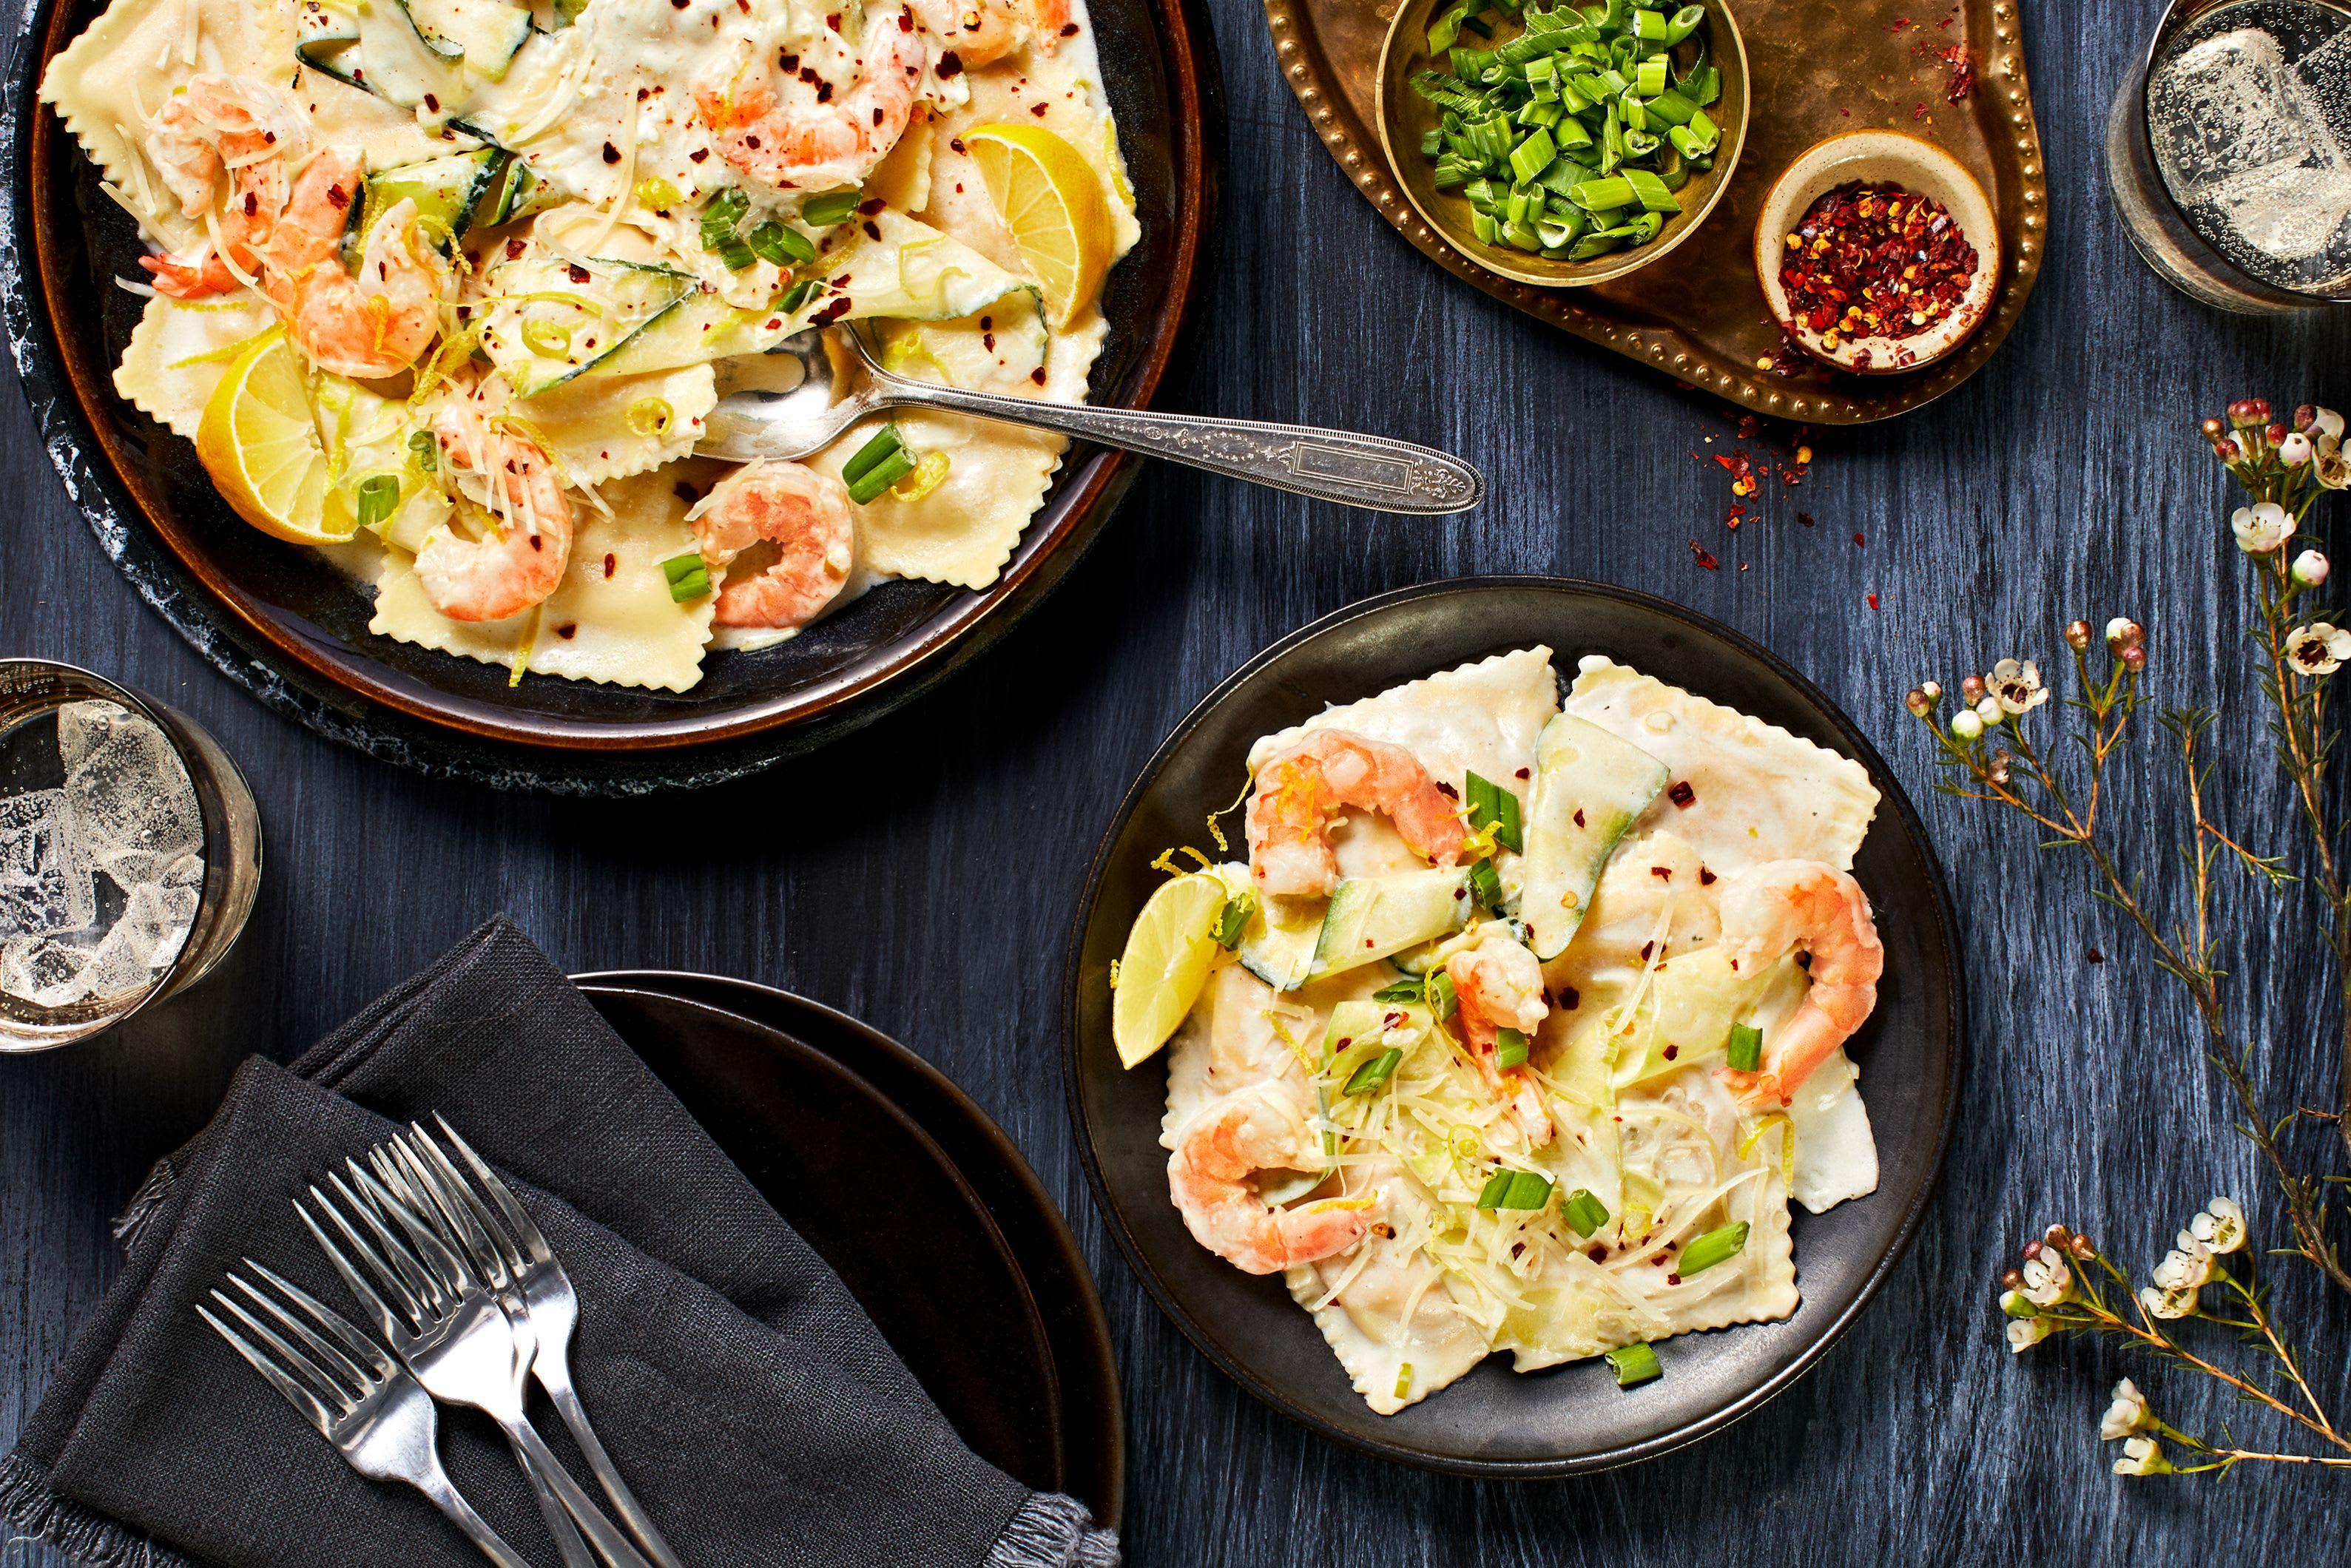 Lobster Ravioli and Shrimp in a Lemon Cream Sauce